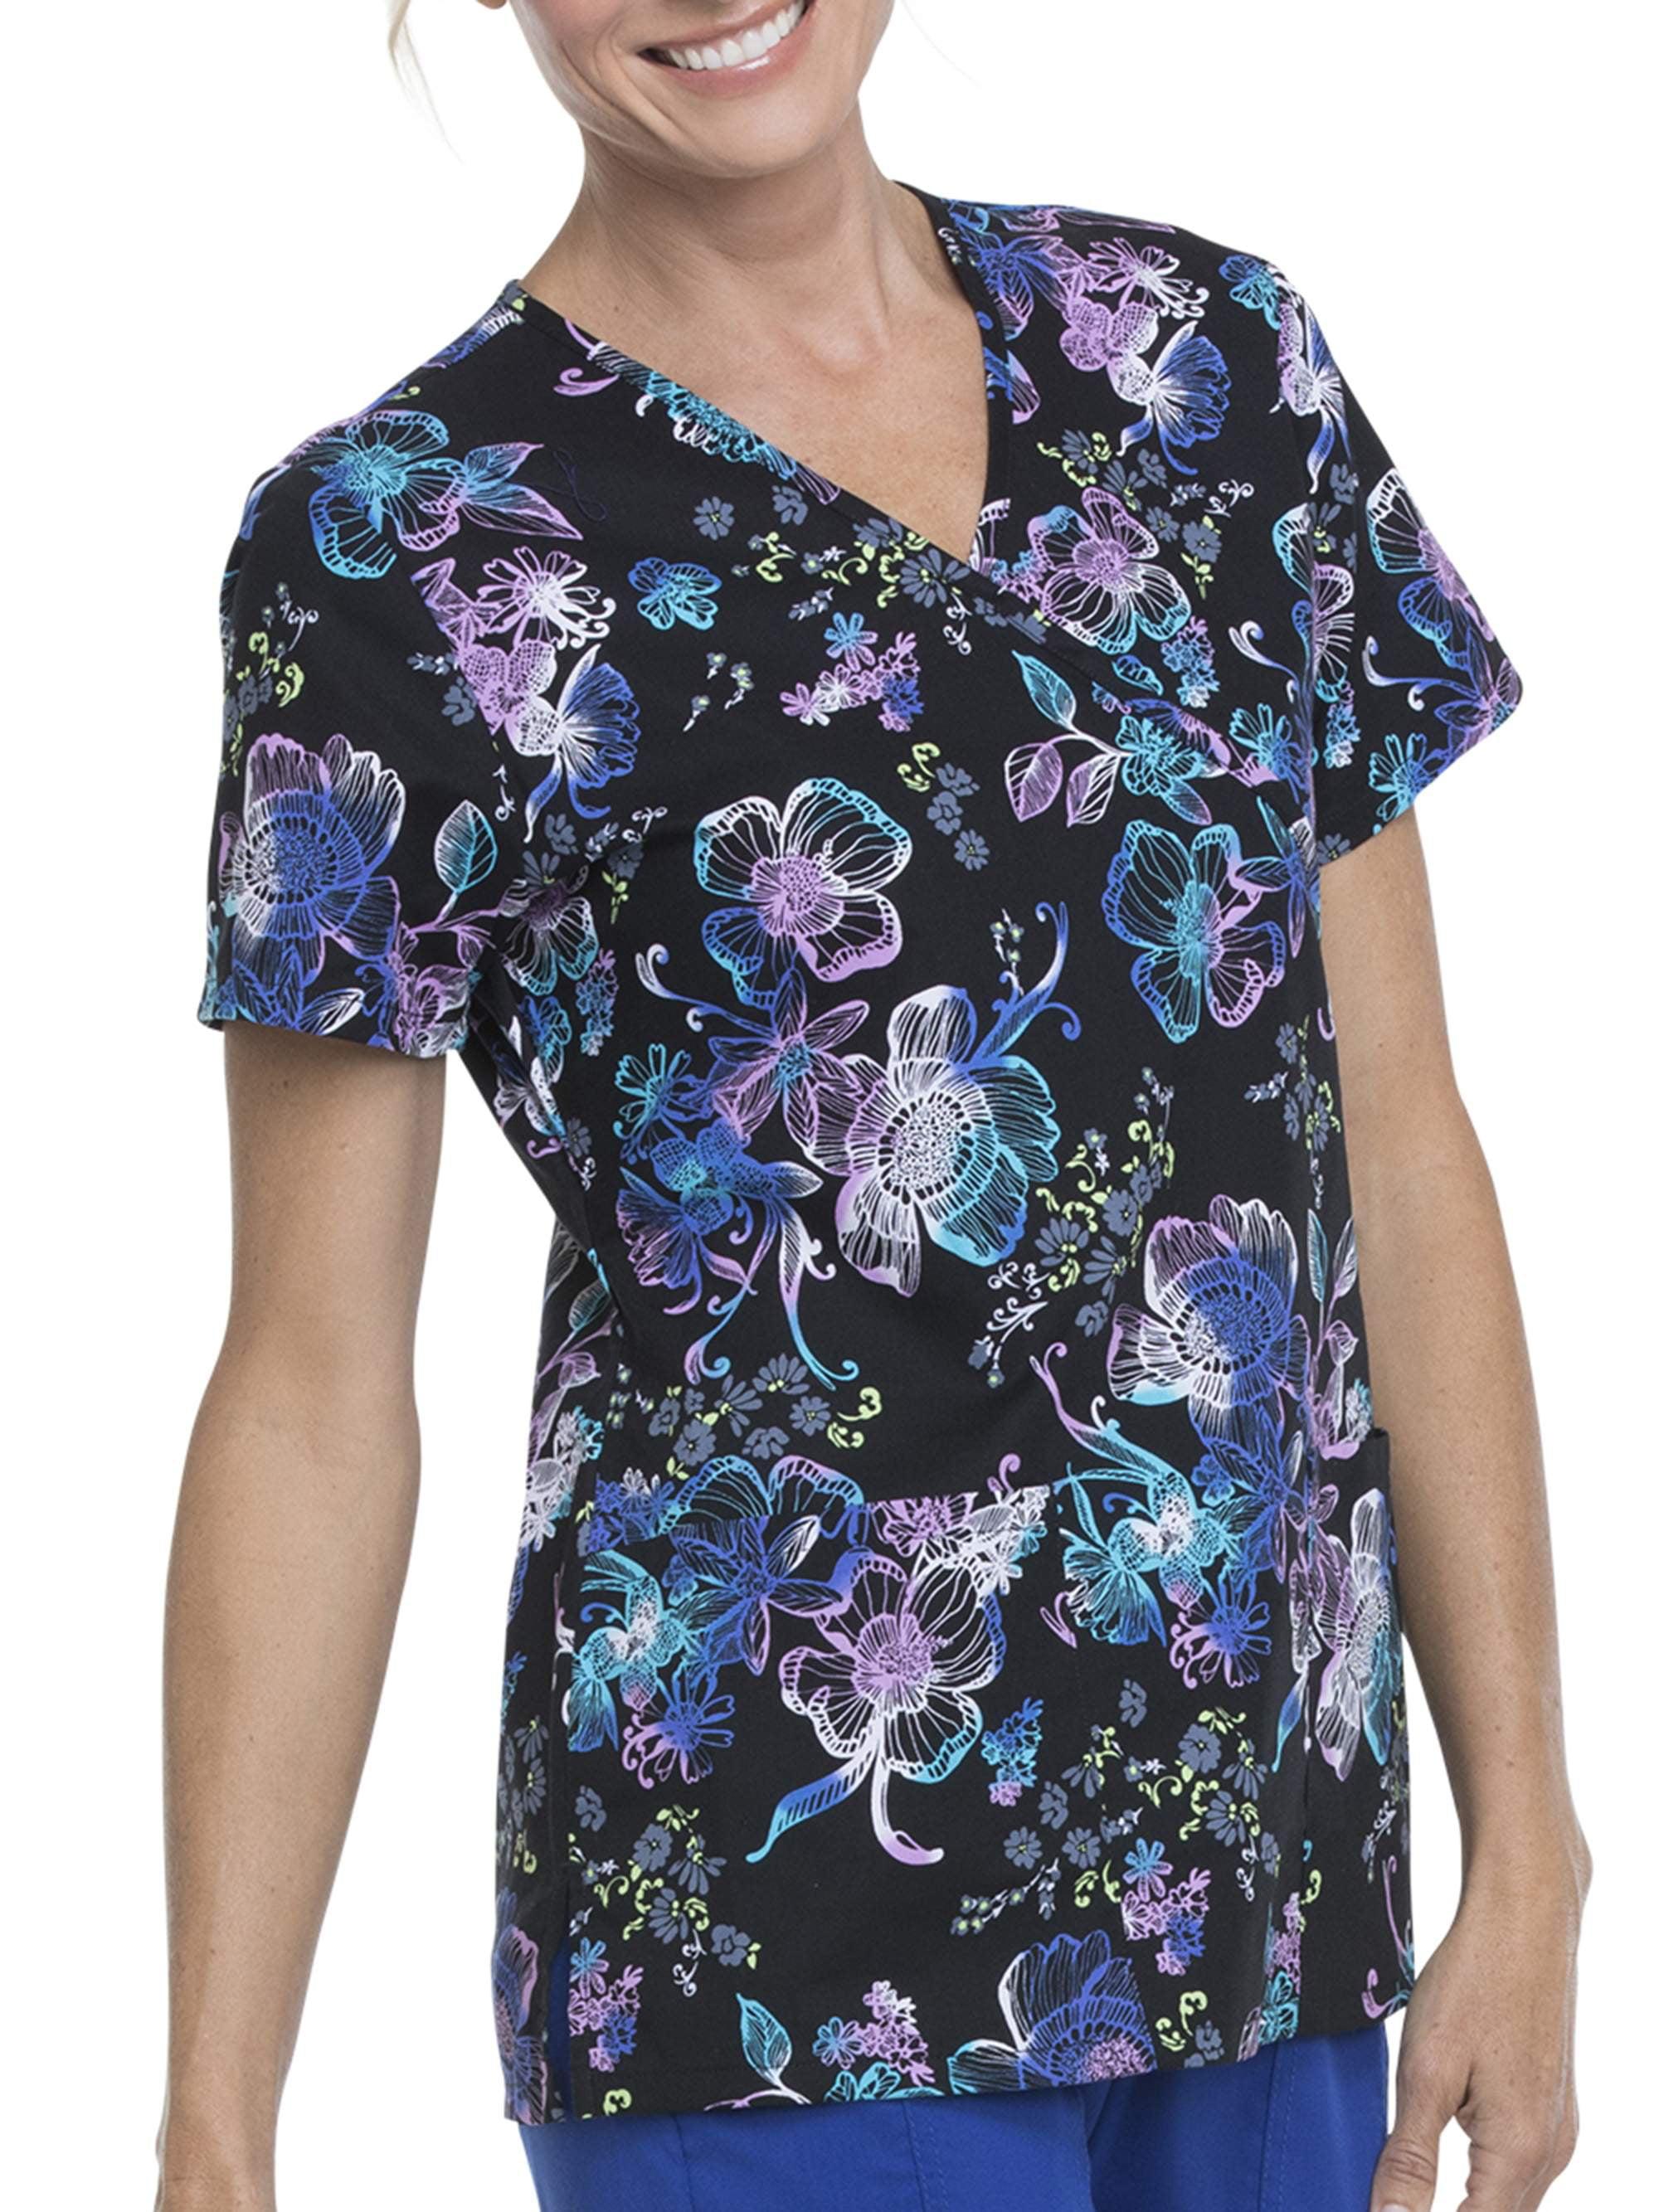 Ladies Branded Spyder Short Sleeves V Neck Top Allure Graphic T Shirt Size 10-16